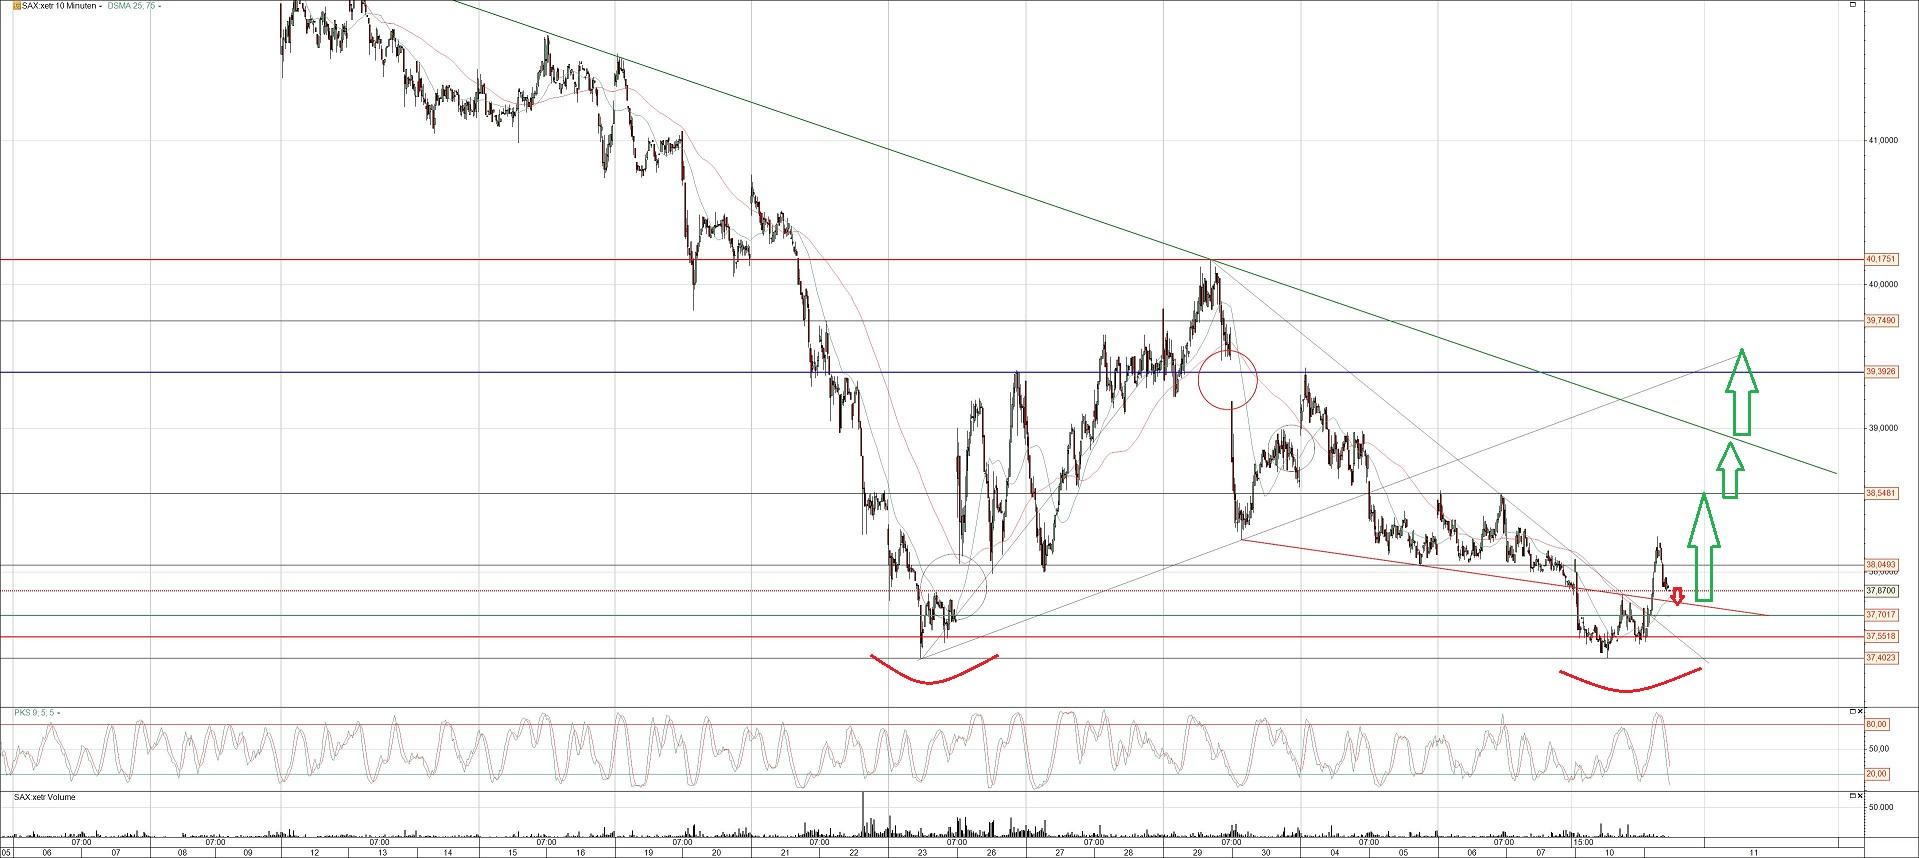 Ströer Aktienchart Analyse